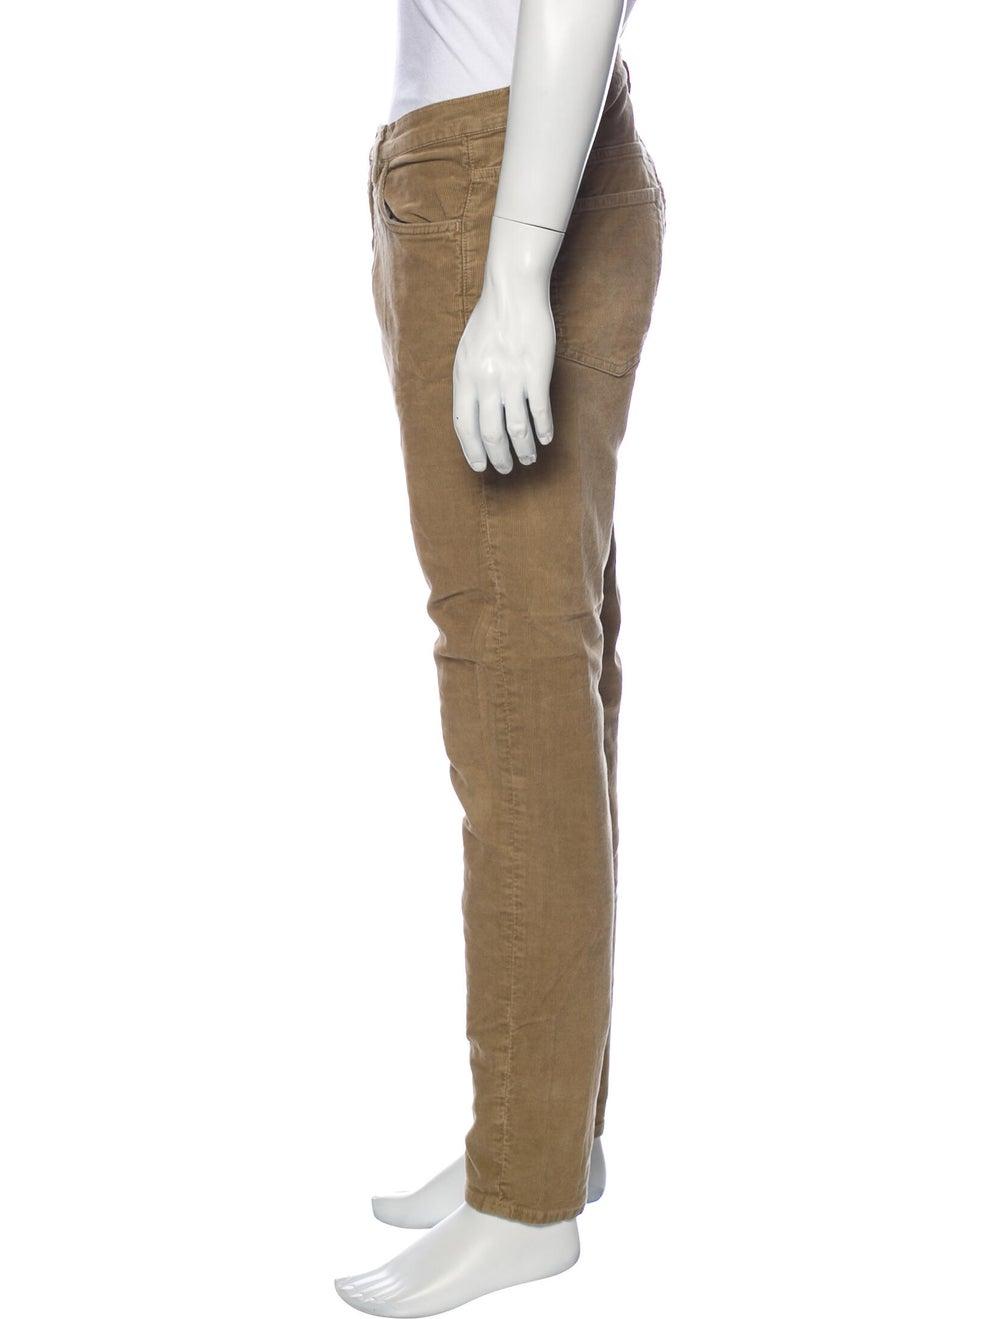 Acne Studios Corduroy Corduroy Pants - image 2